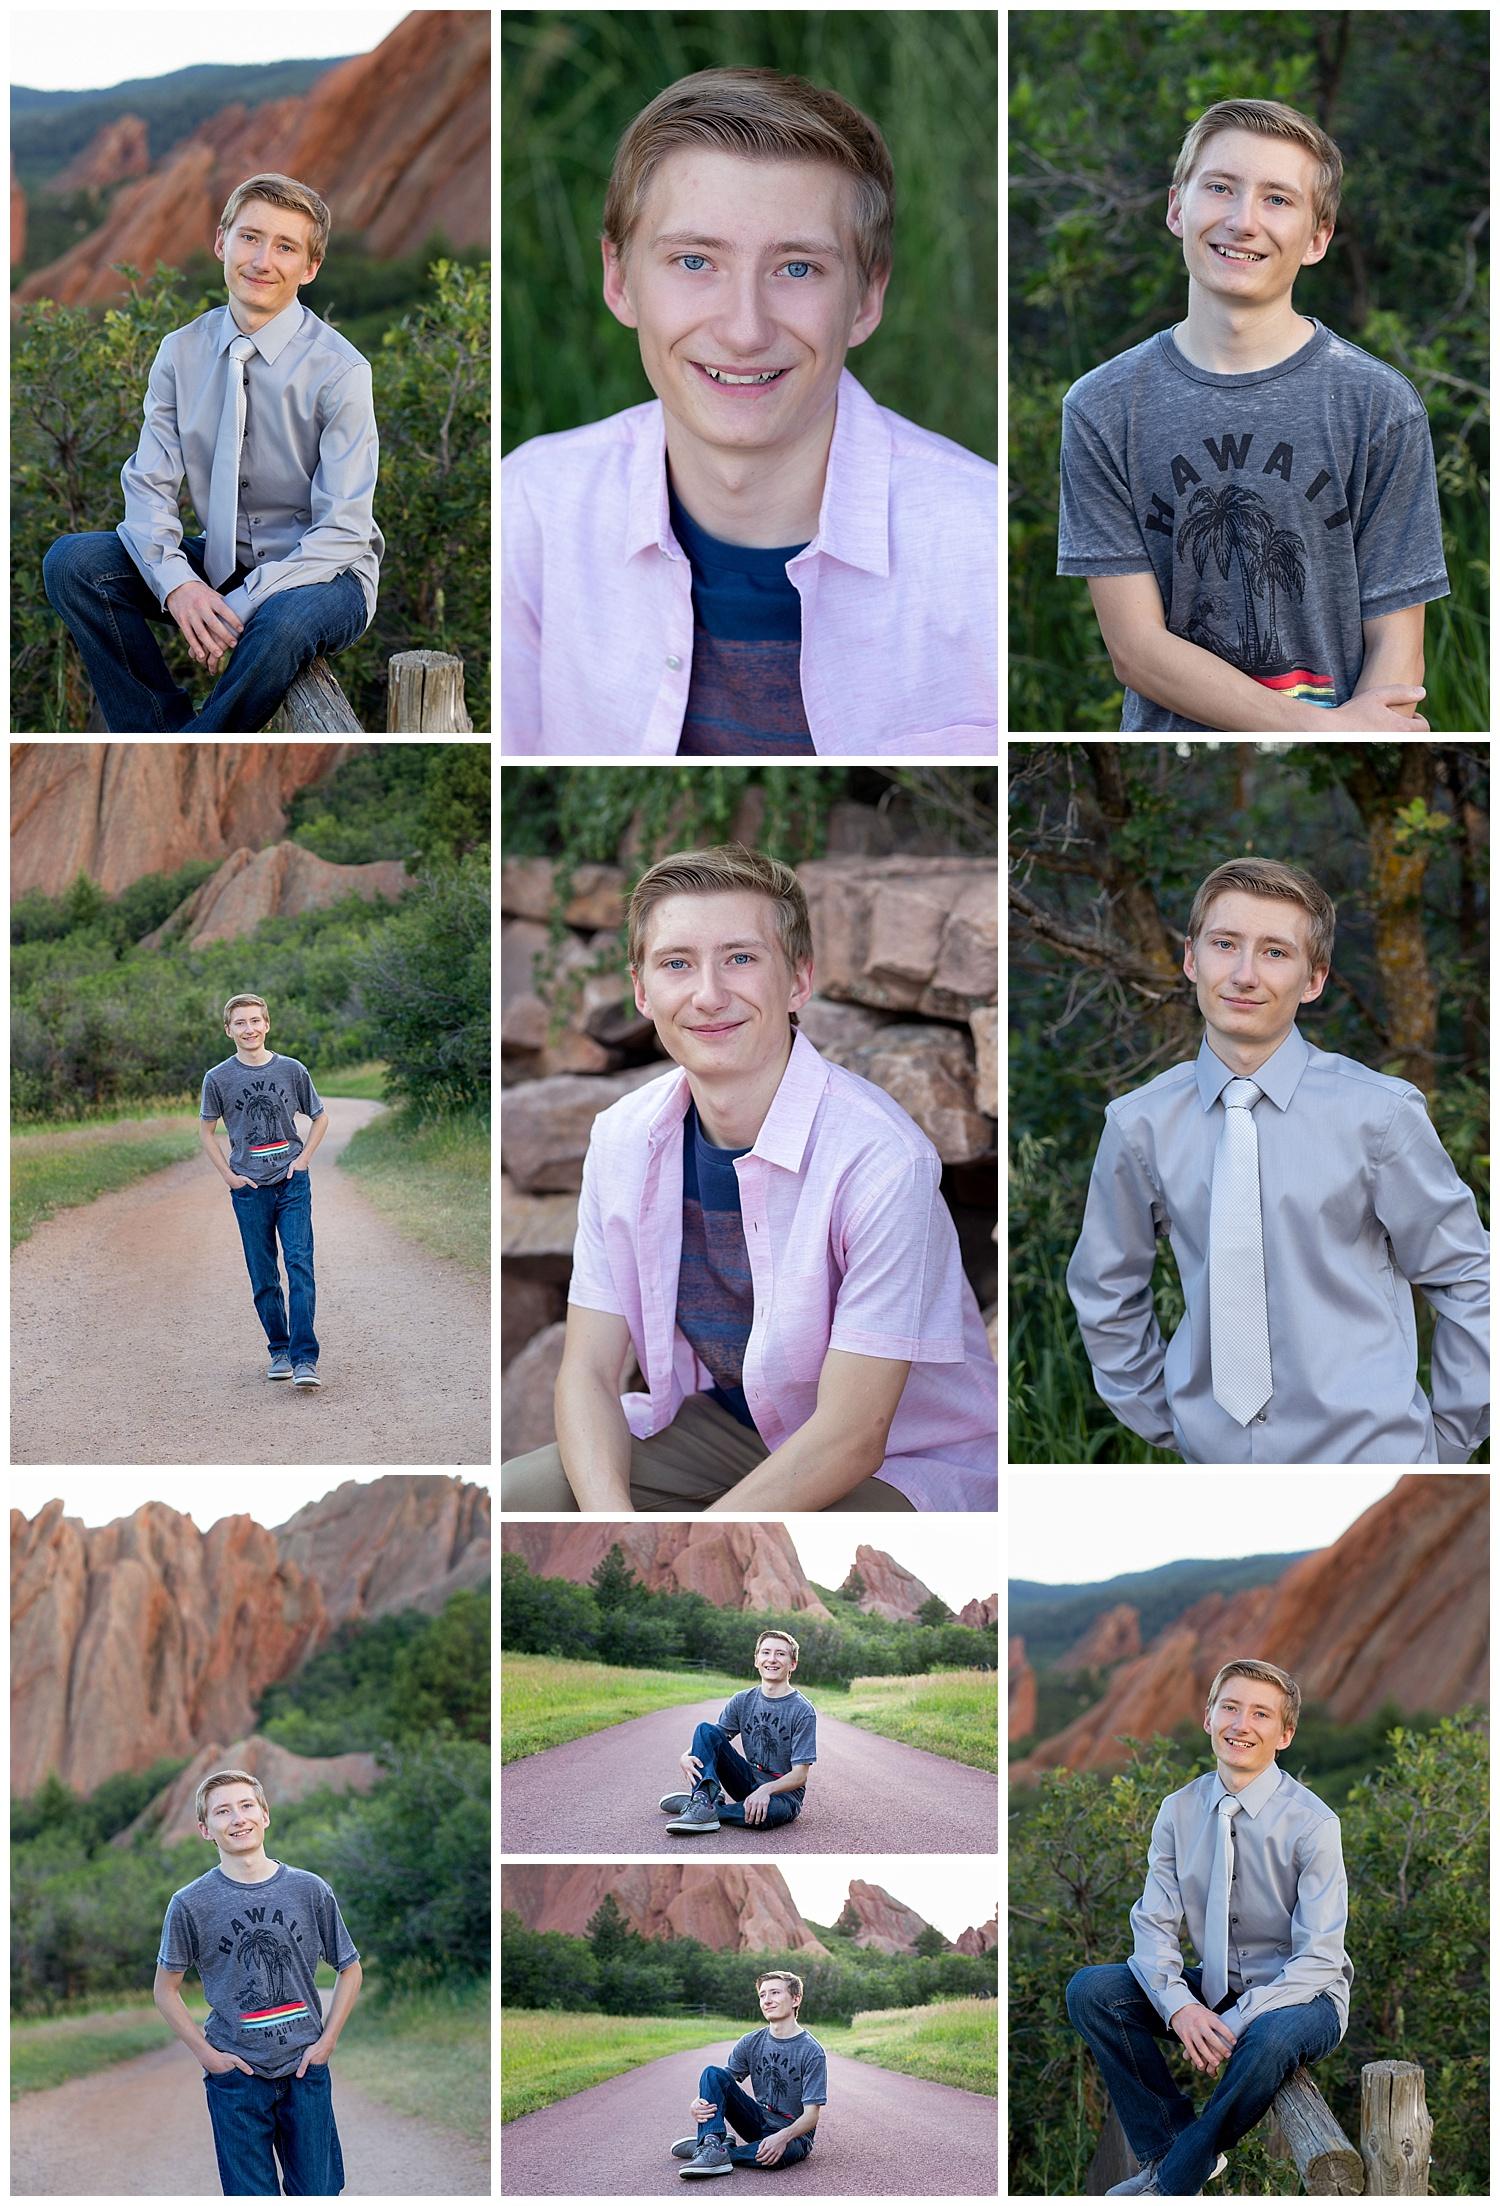 Jay had his high school senior portraits taken on July 10, 2019.